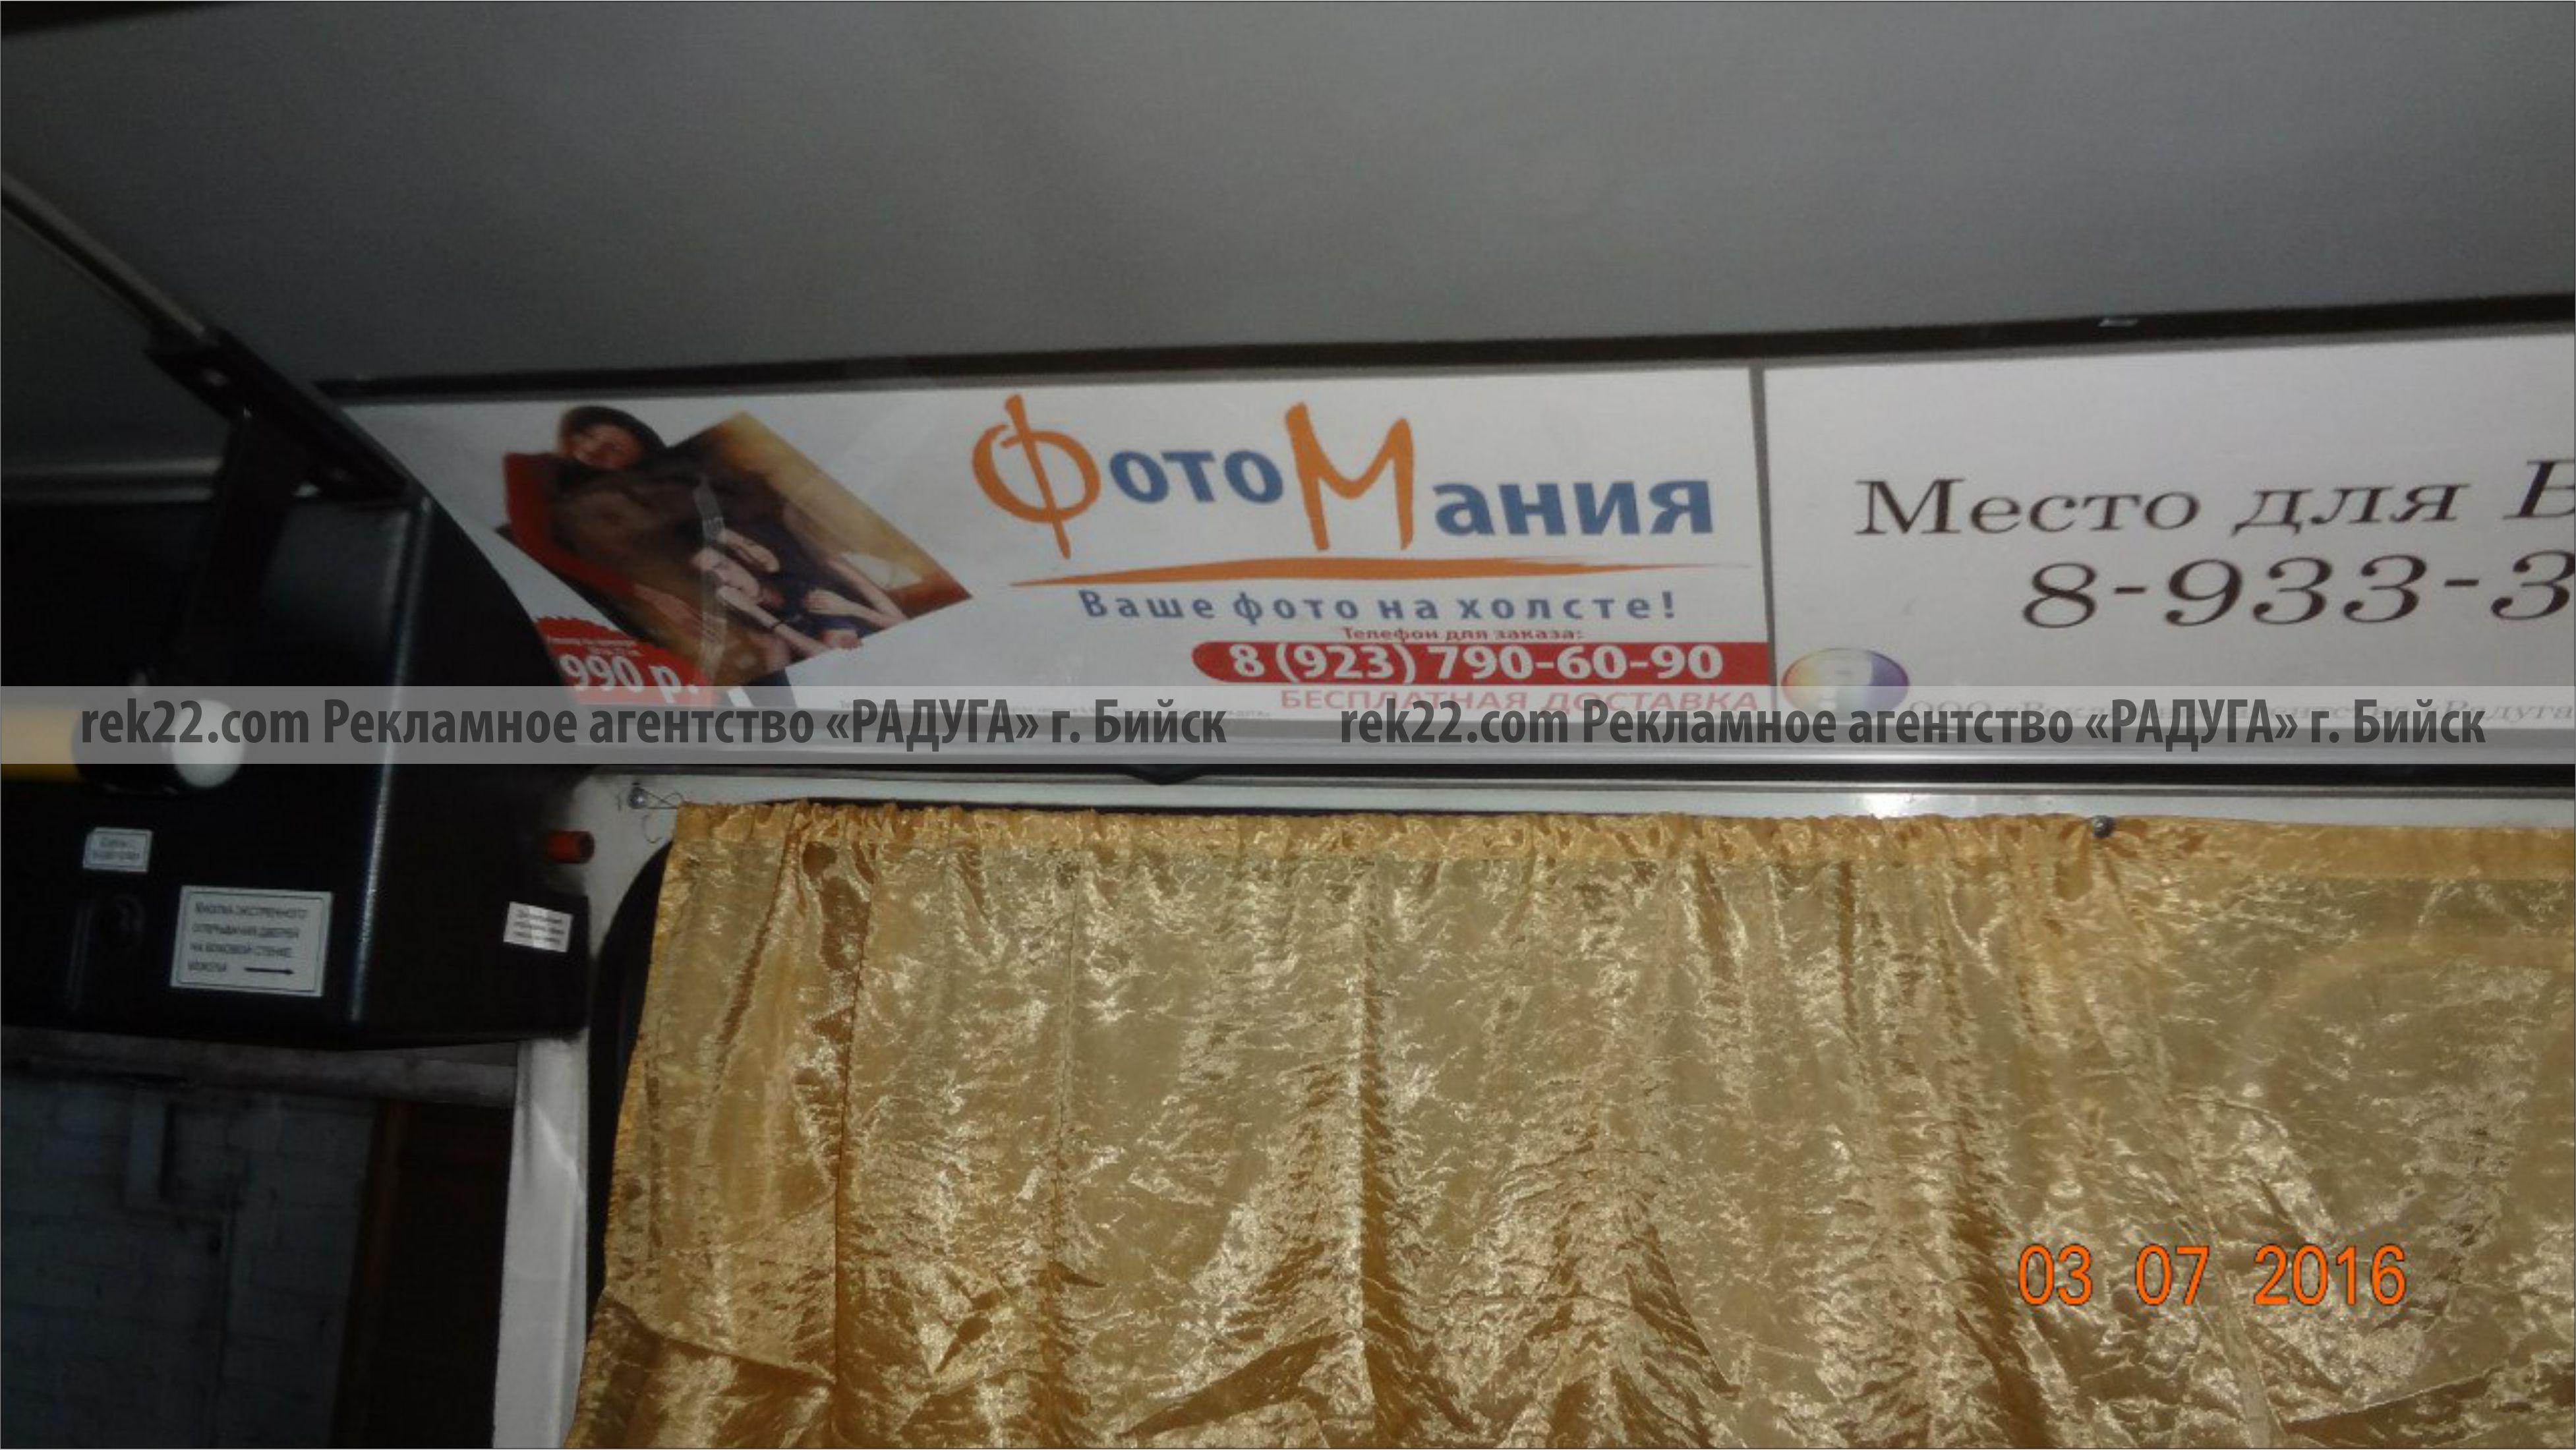 Реклама на транспорте Бийск - карманы, листовки - 8